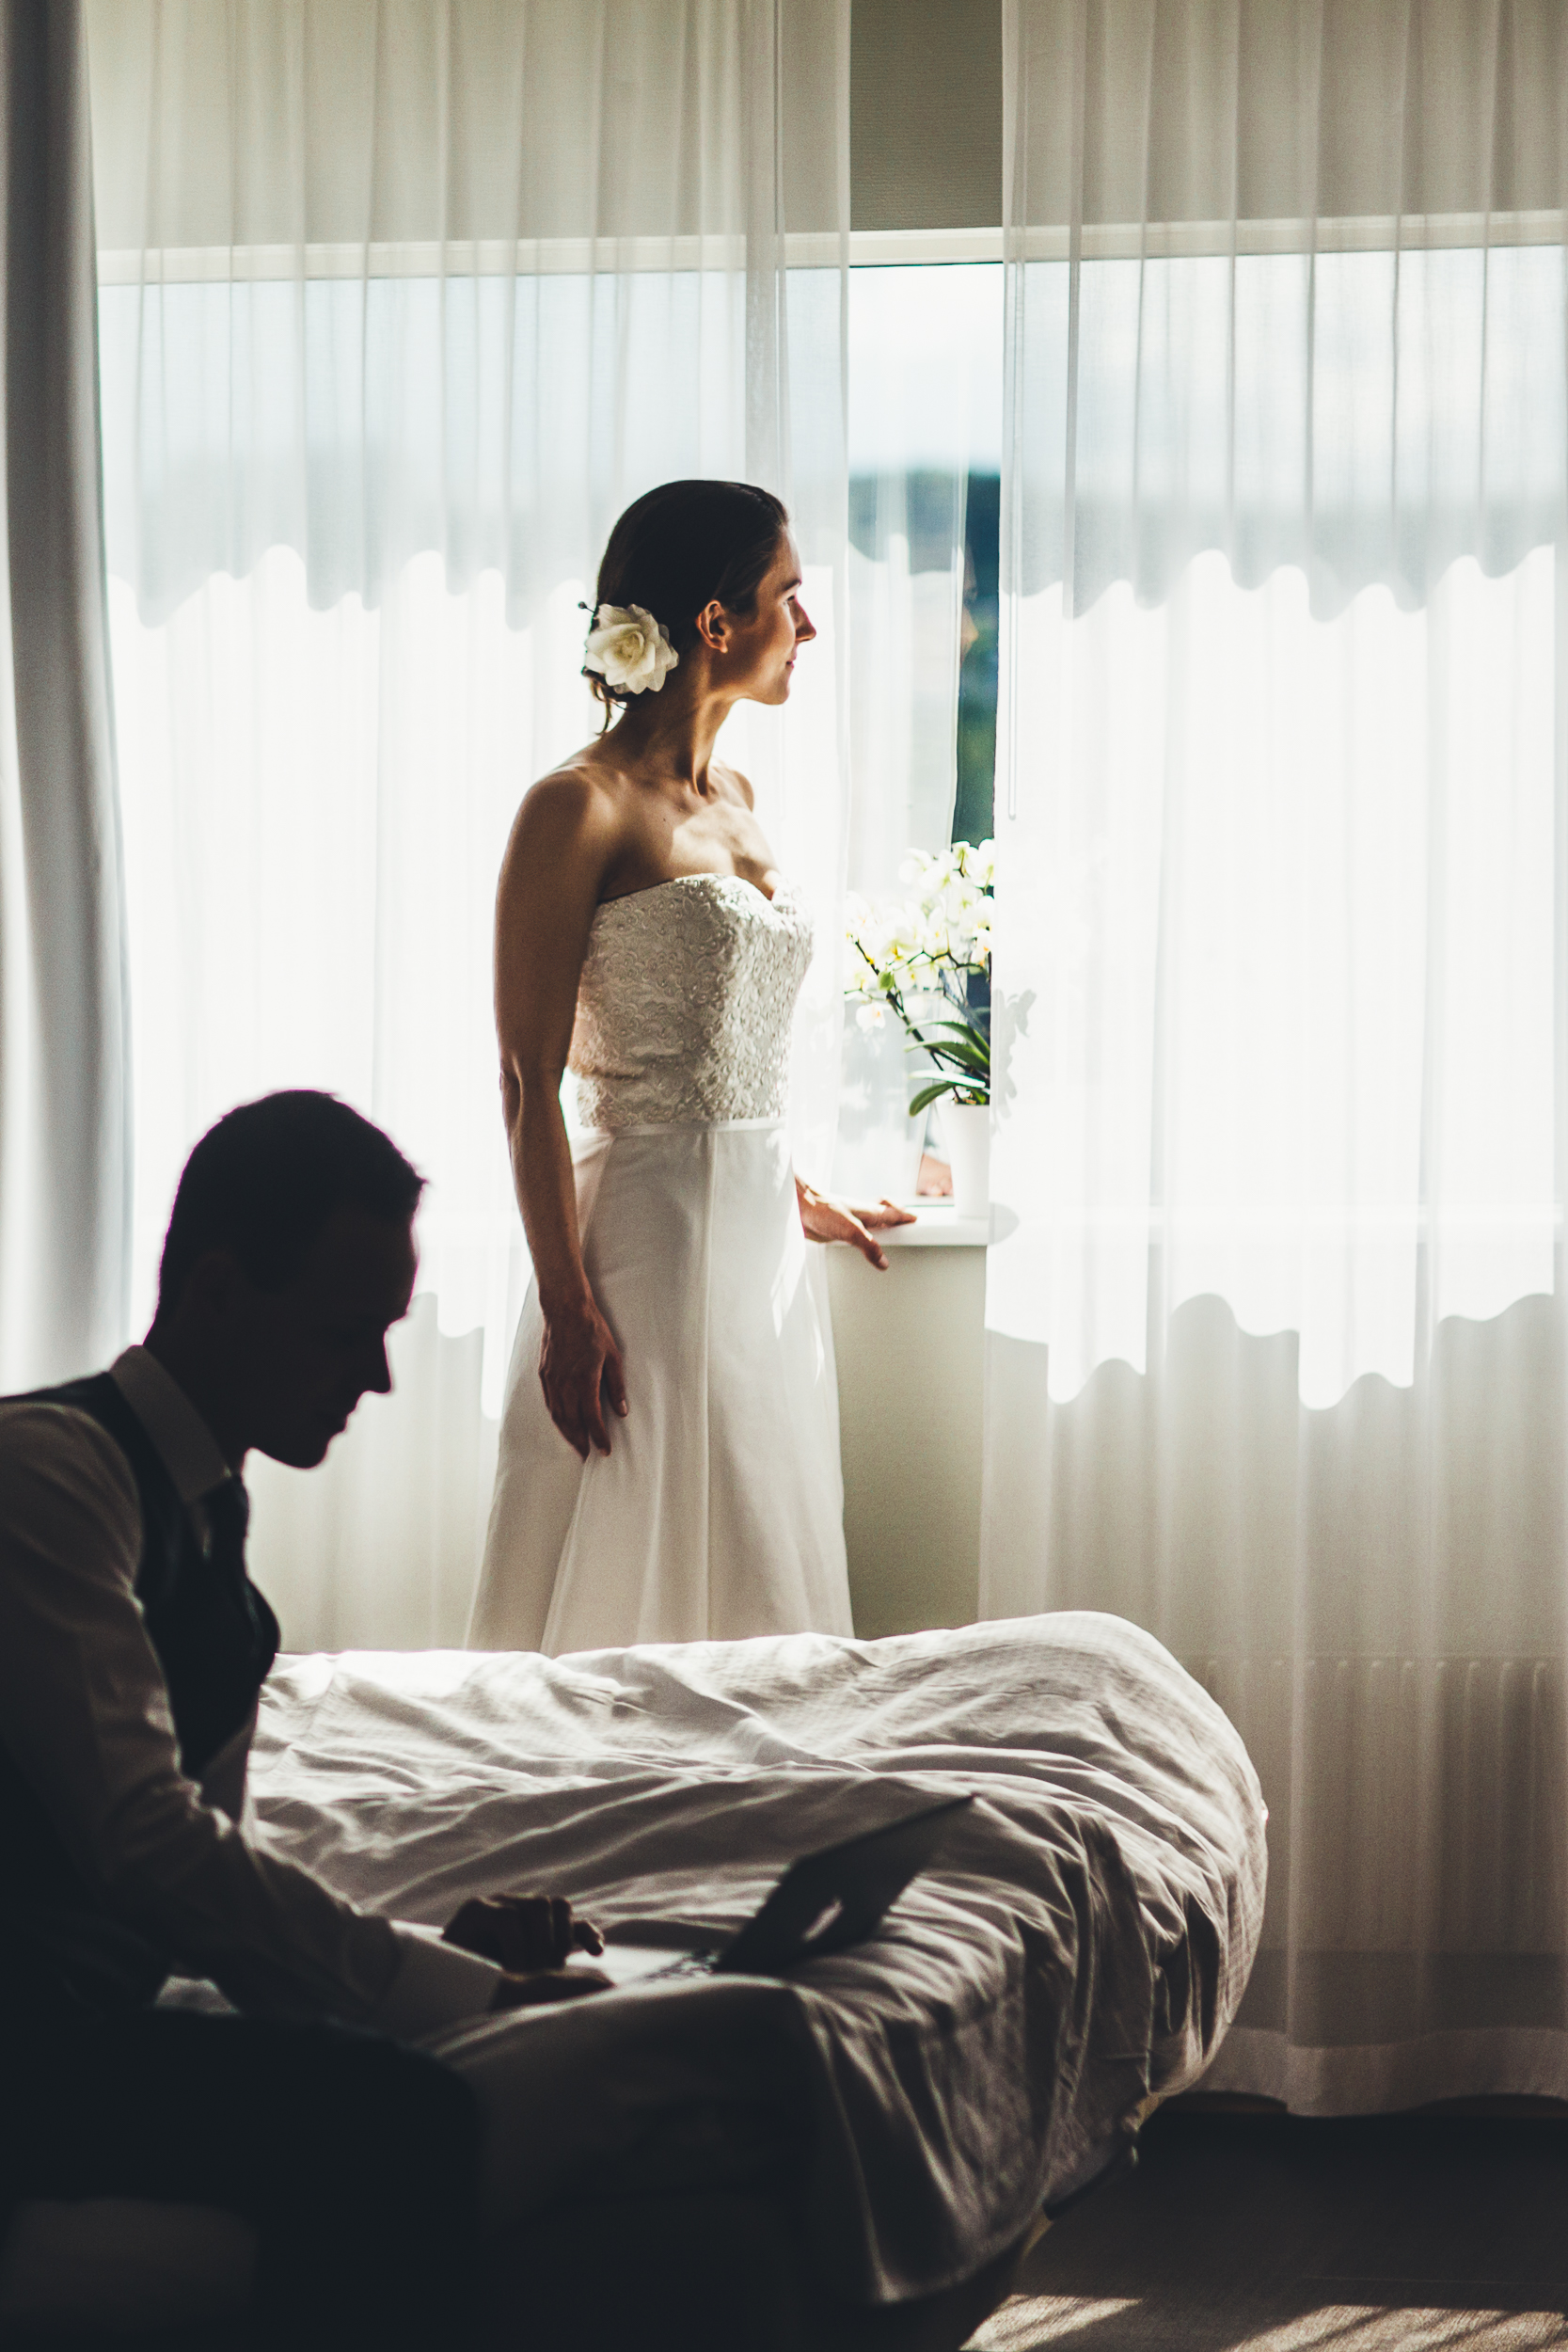 Wedding_Anna_Martin_20140607_439